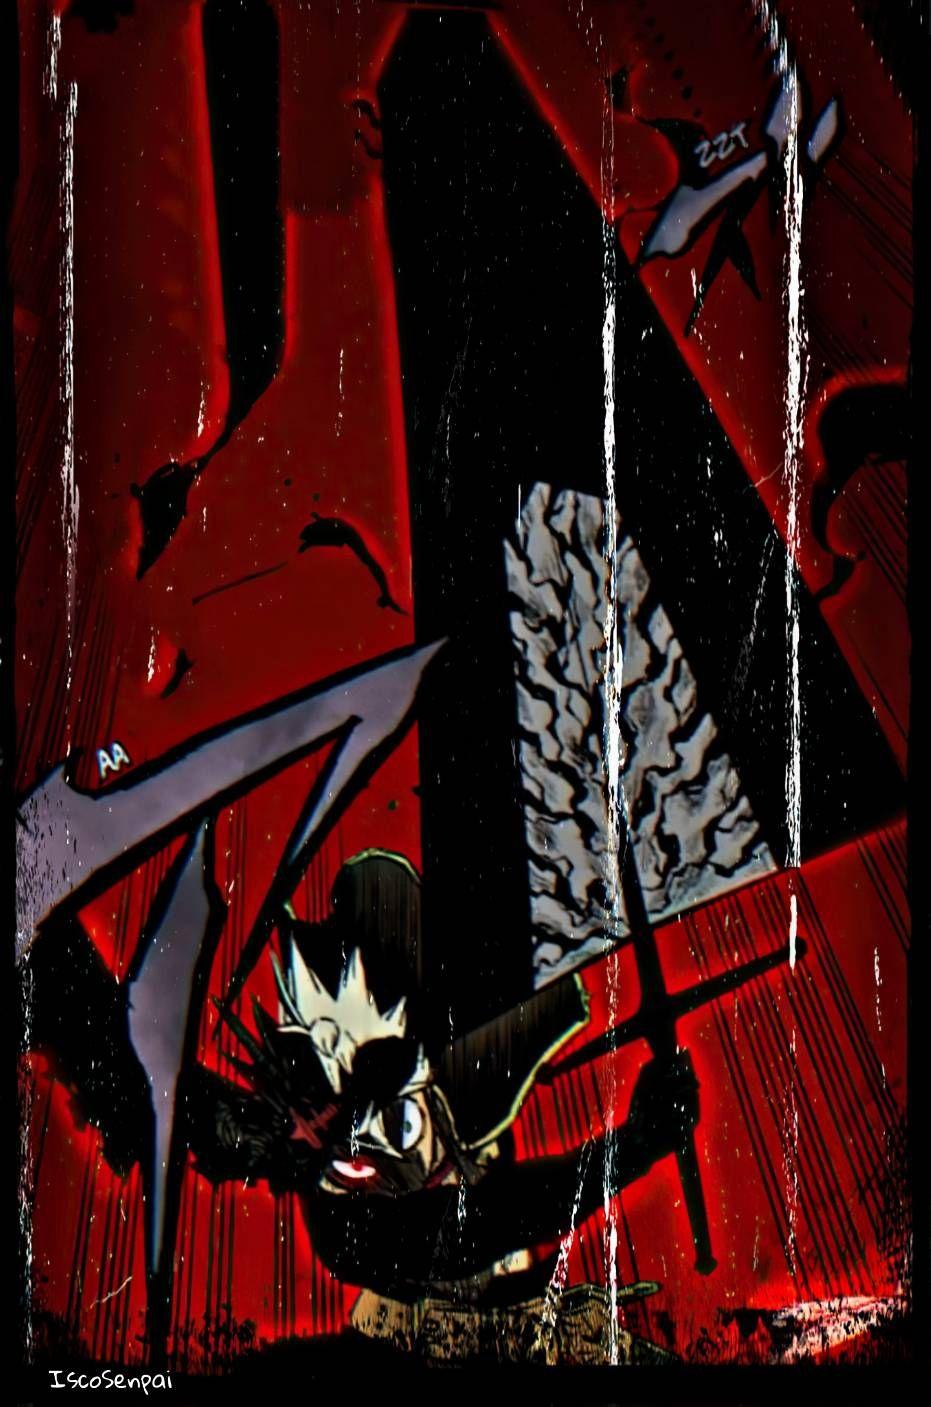 Pin By Shannon Davis On M A N G A In 2020 Black Clover Anime Black Clover Manga Clover